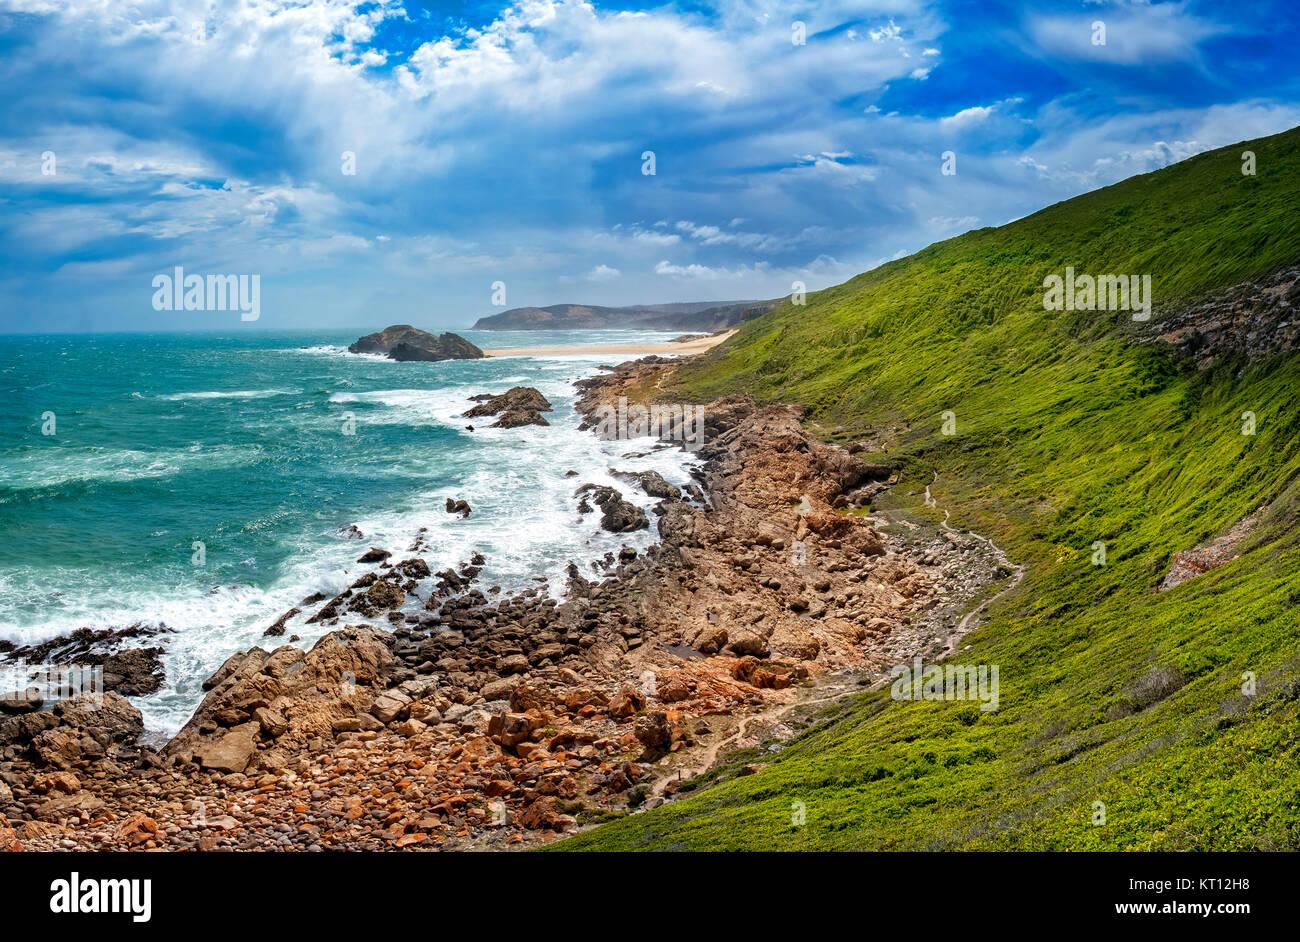 Tremendous Robbberg nature reserve coastline at Plettenberg bay, South Africa. Stock Photo